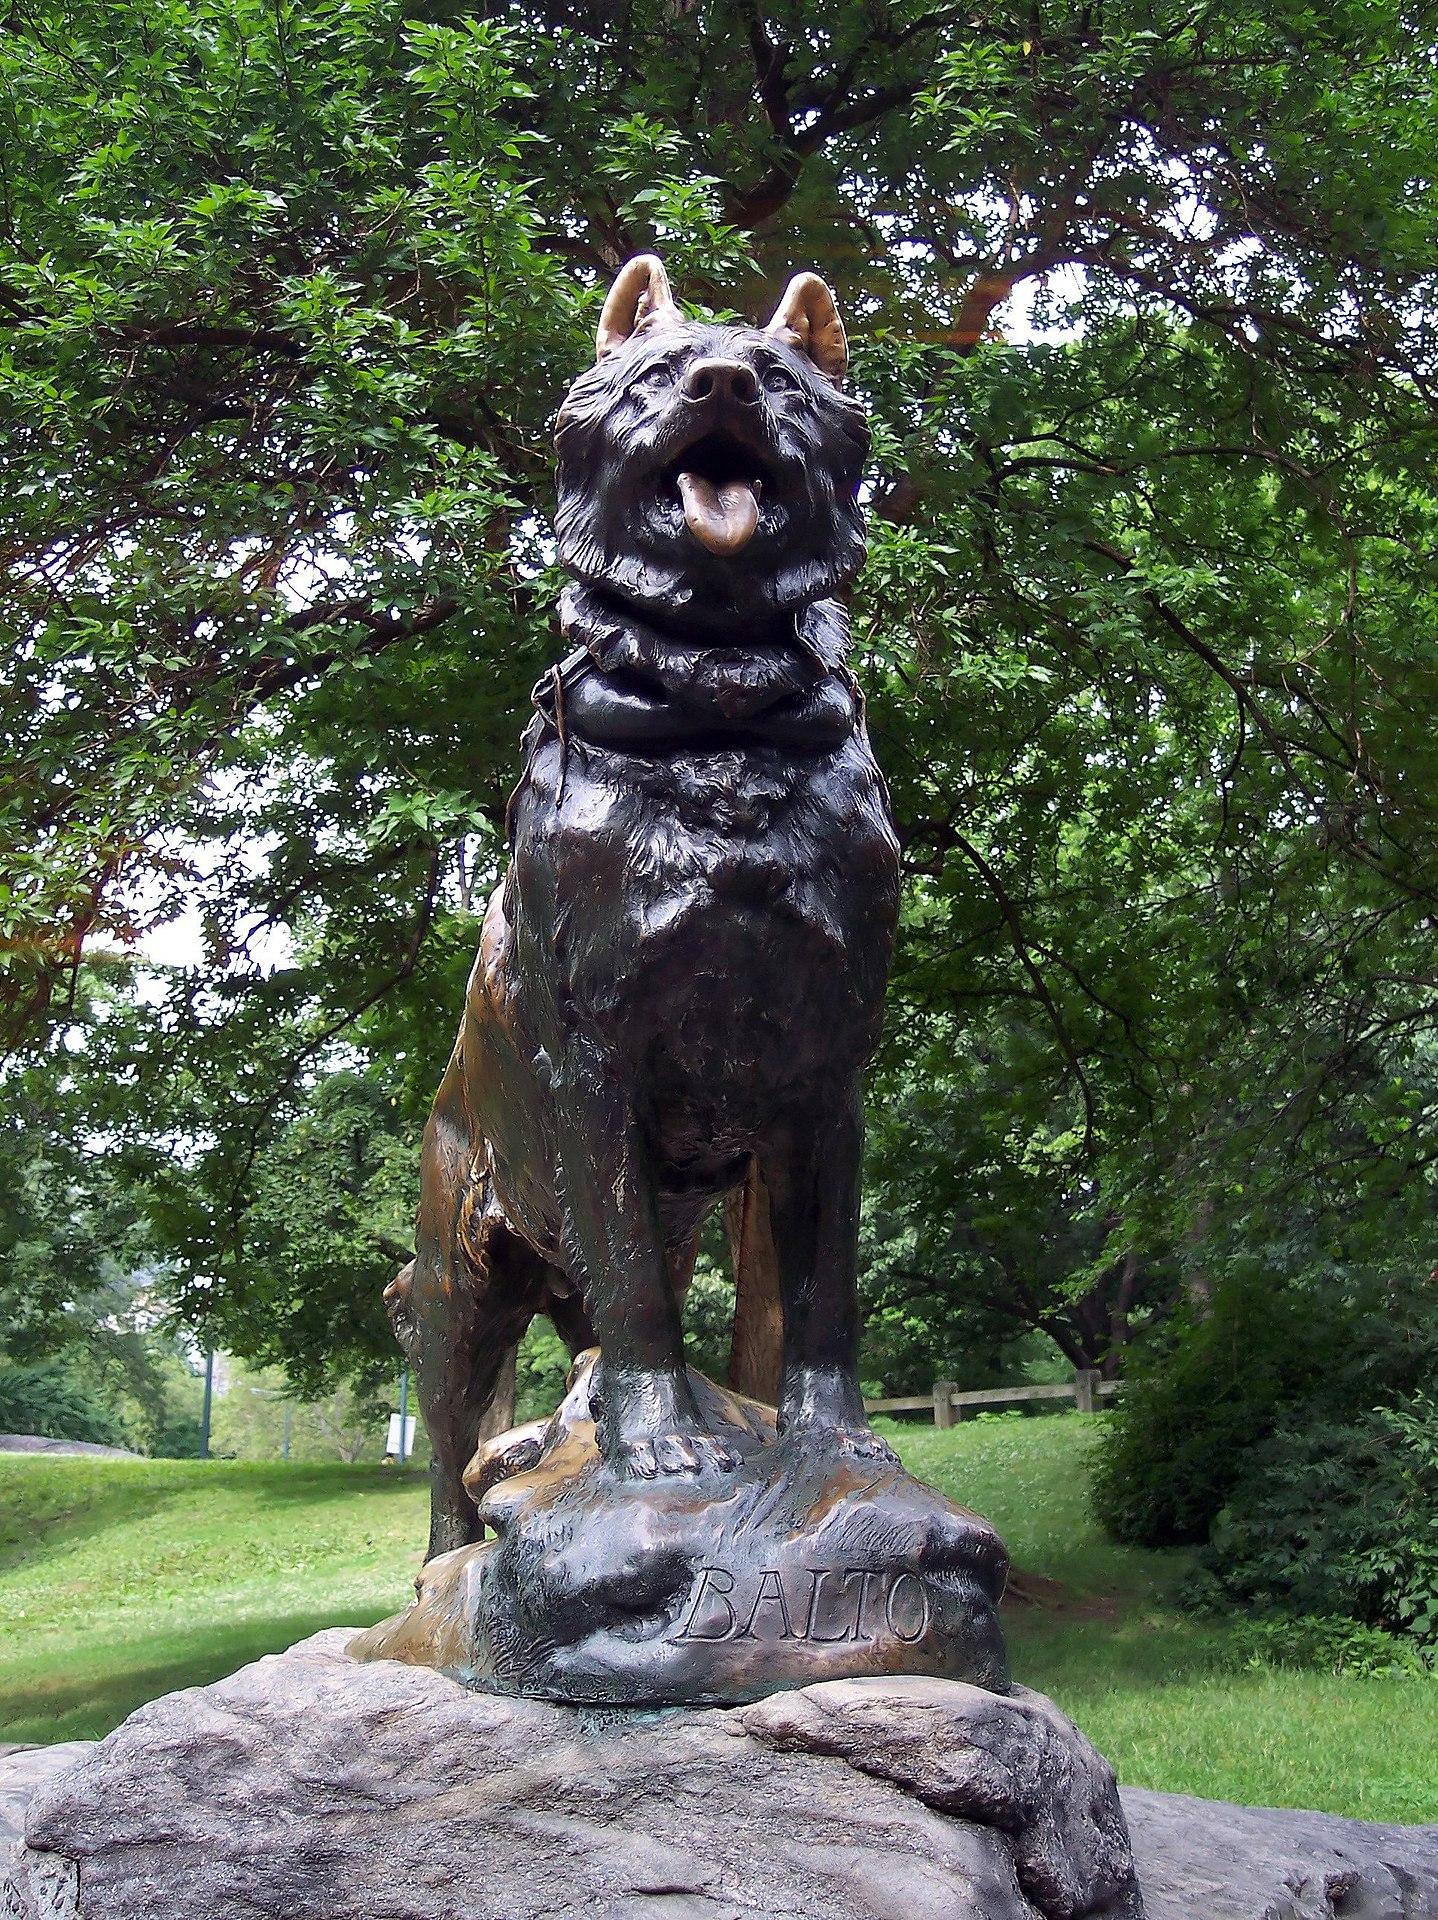 Balto immortalized in NY's Central Park